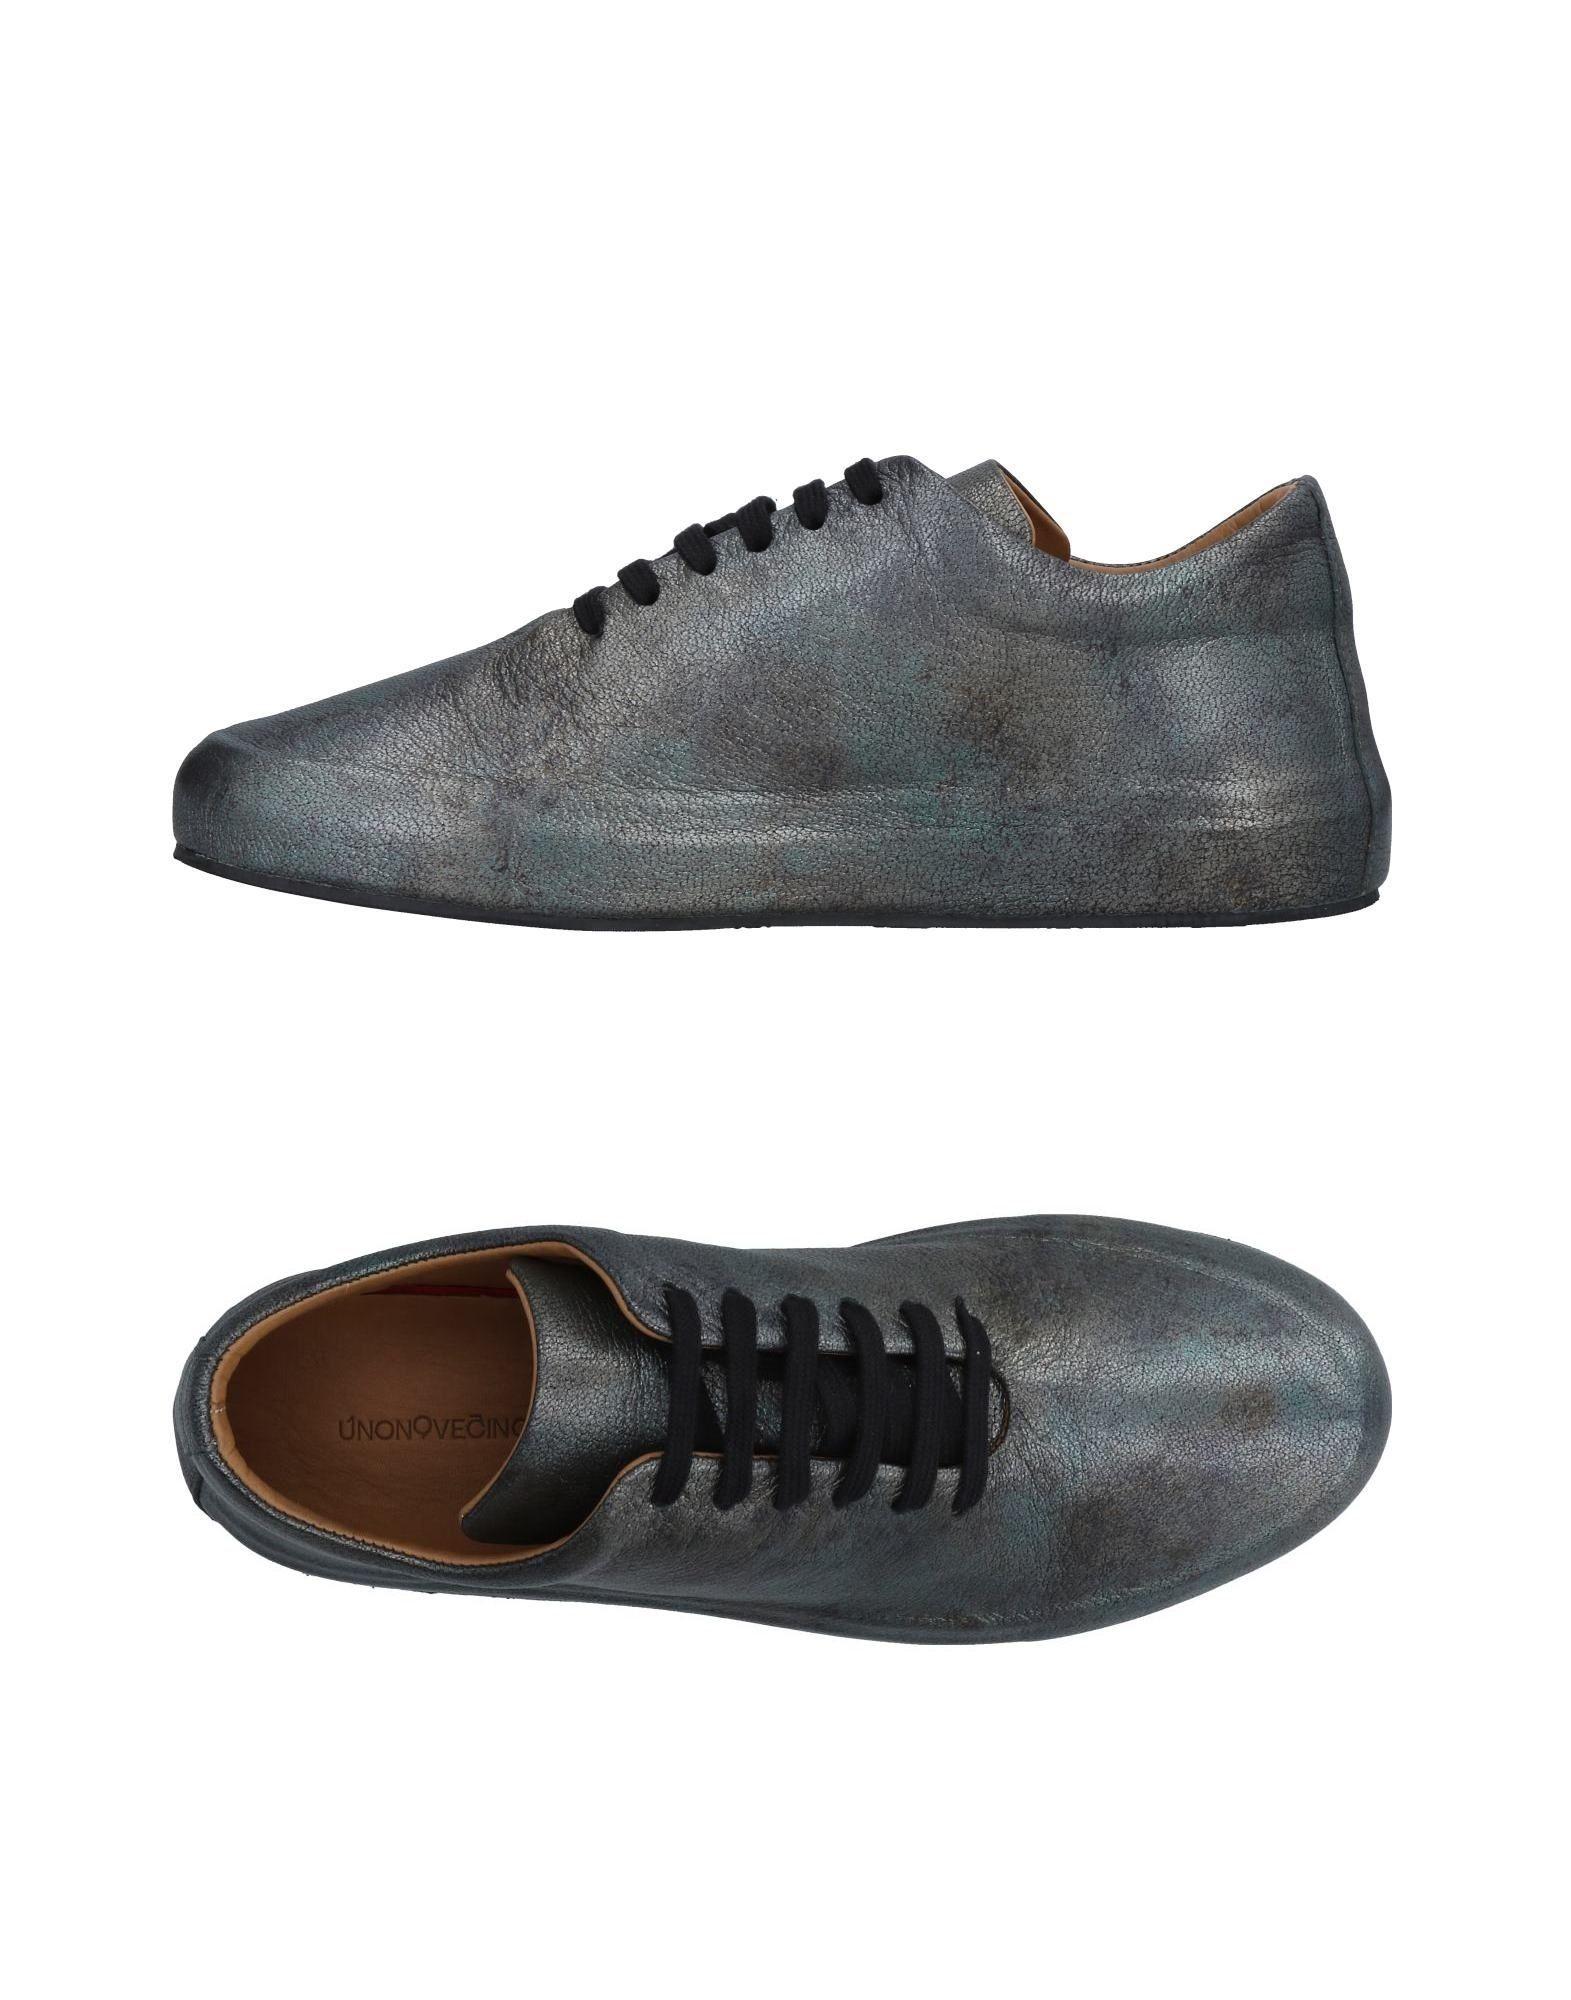 UNONOVECINQUE Sneakers in Silver